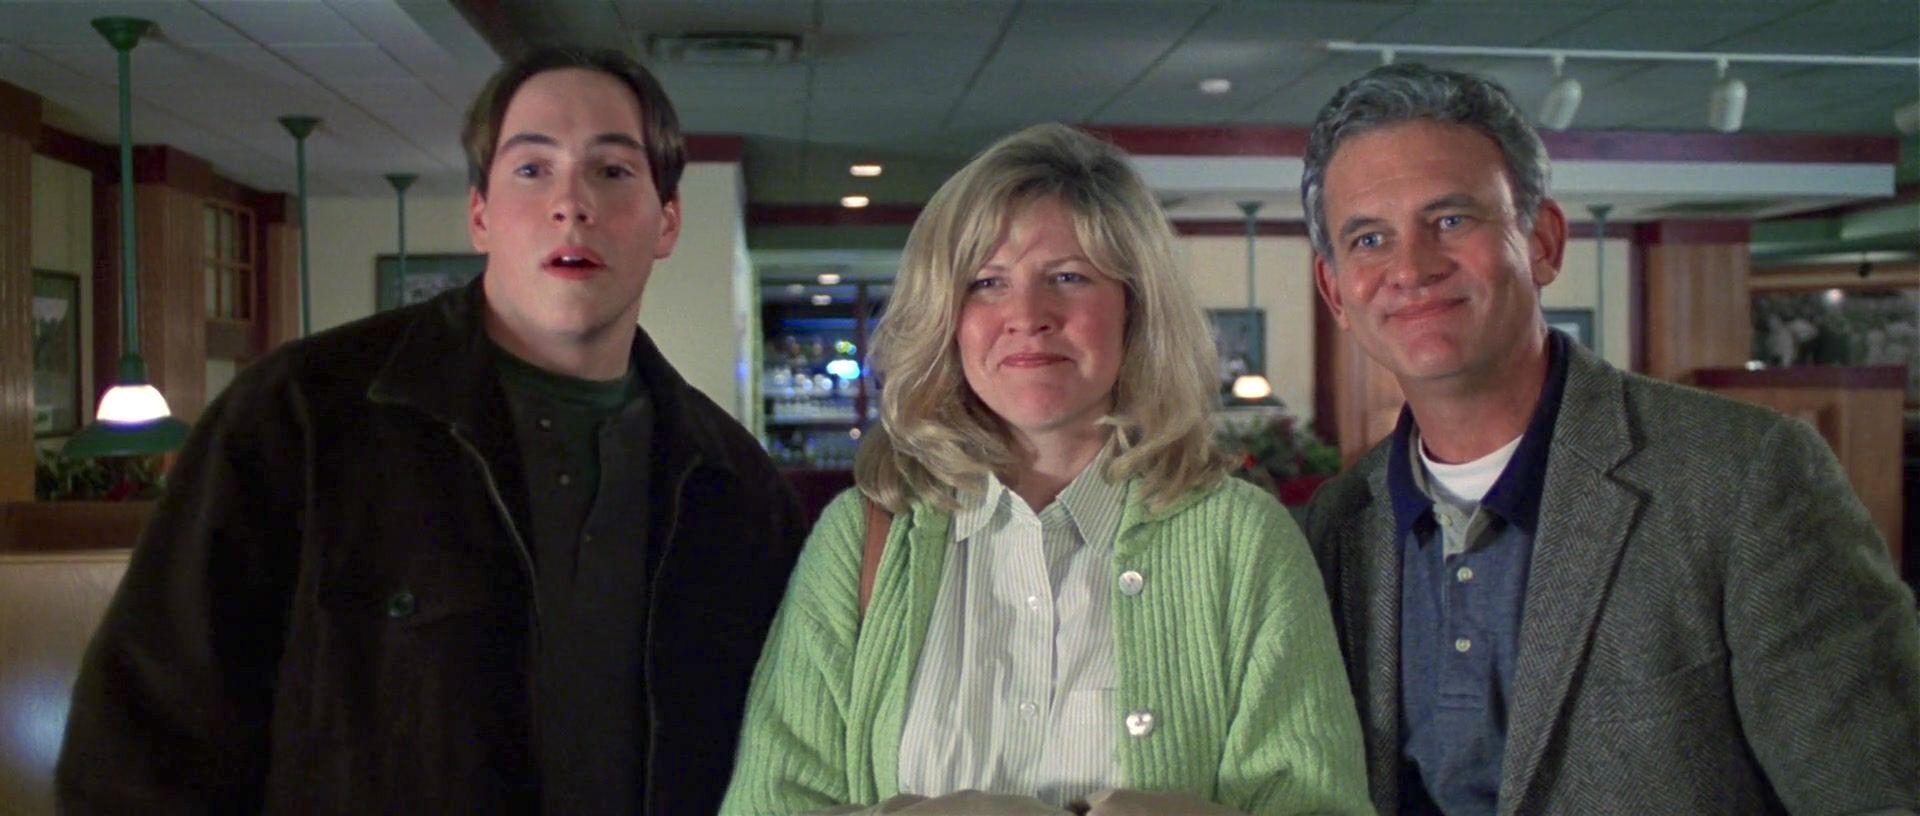 Chris Klein, Jeanine Jackson, and Holmes Osborne in Election (1999)